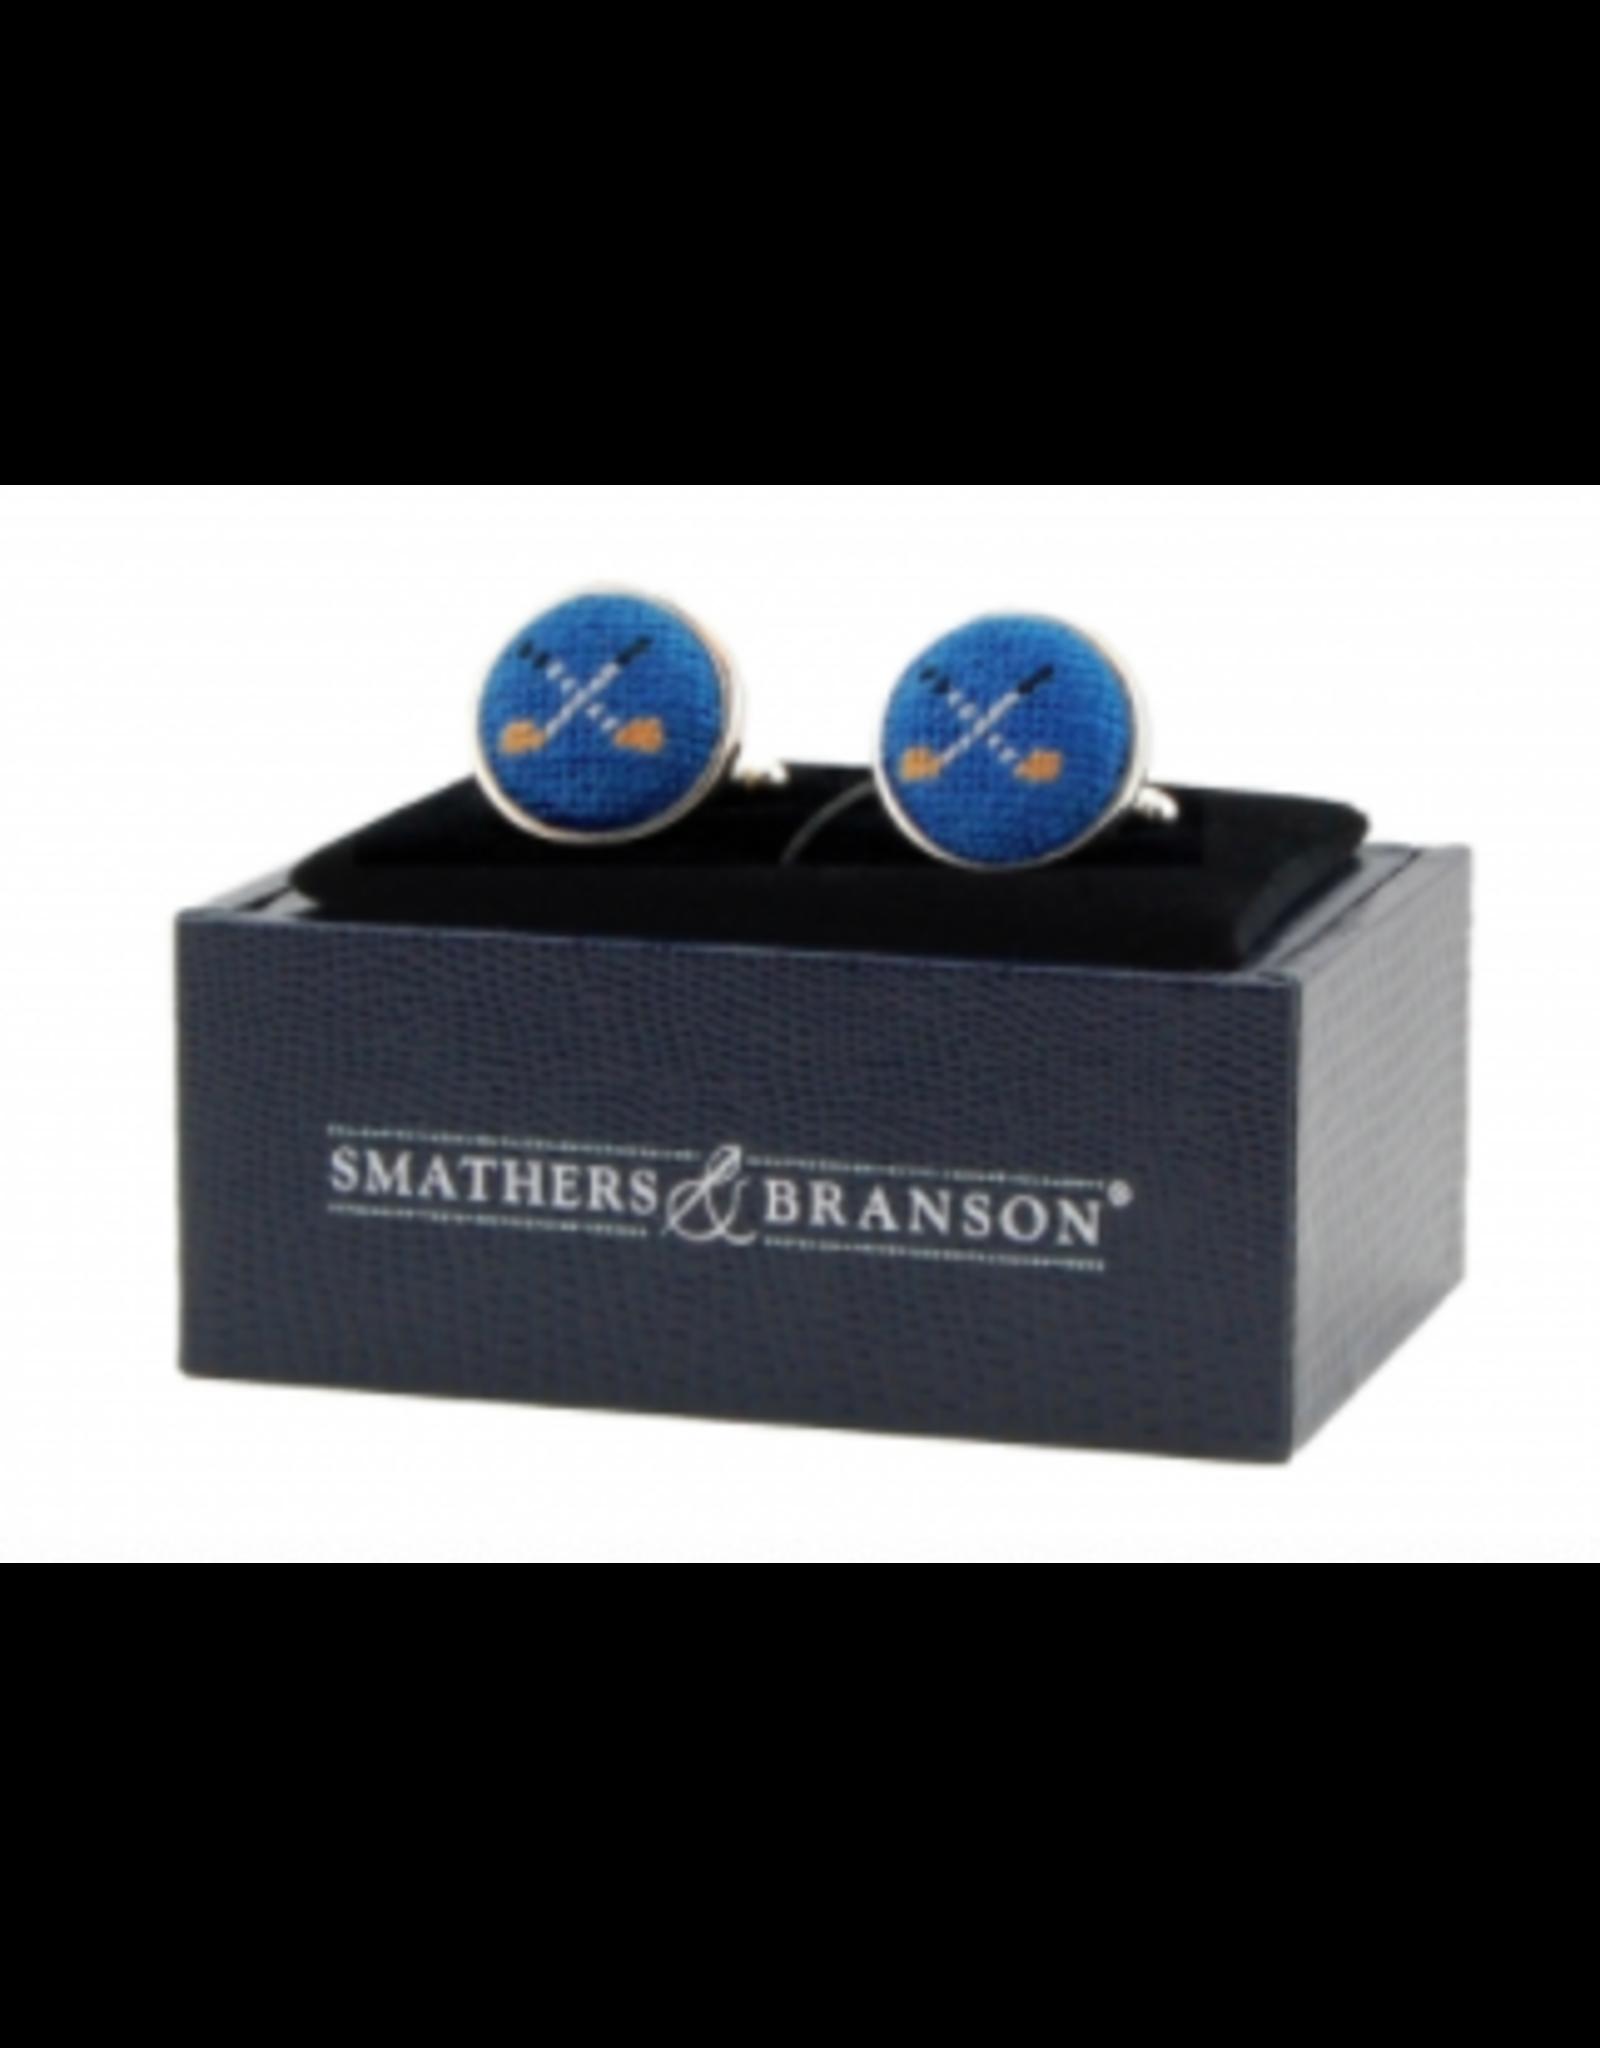 Smathers & Branson Crossed Club Cuff Links